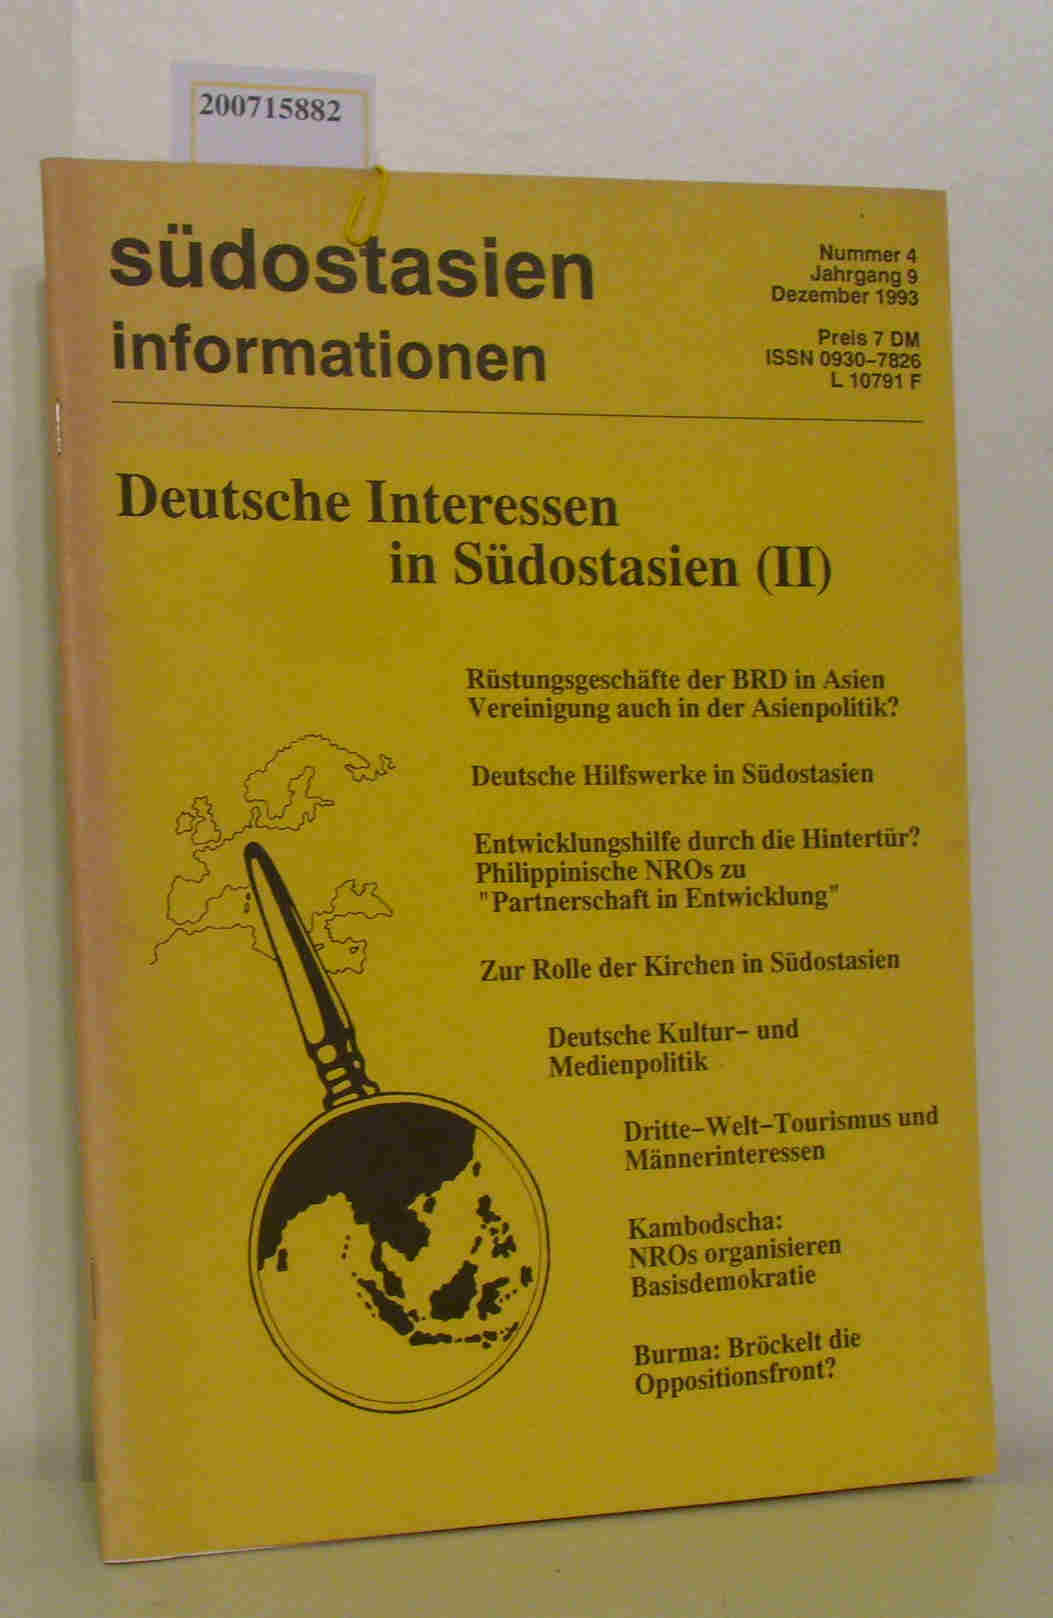 Südostasien Information Nr. 4, Jhrgang 9, Dezember 1993 Deutsche Interessen in Südostasien (II)